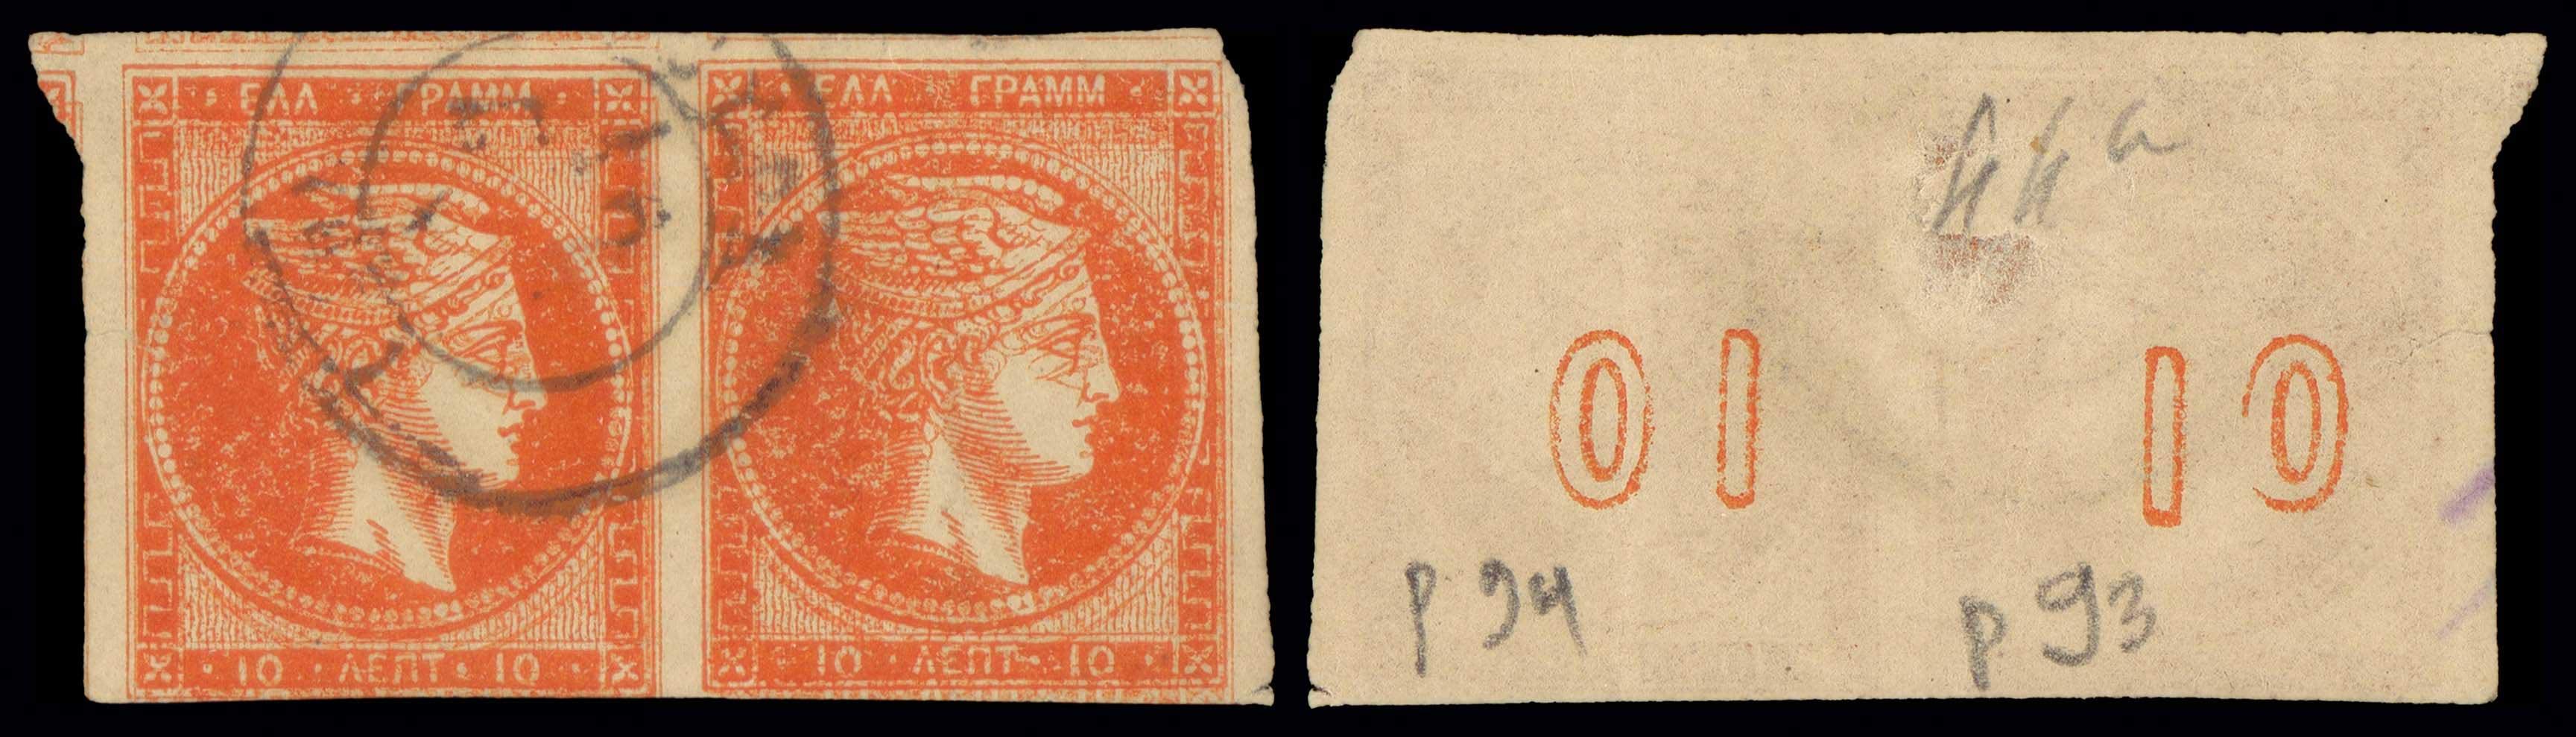 Lot 255 - GREECE-  LARGE HERMES HEAD 1875/80 cream paper -  A. Karamitsos Public & LIVE Bid Auction 600 Coins, Medals & Banknotes